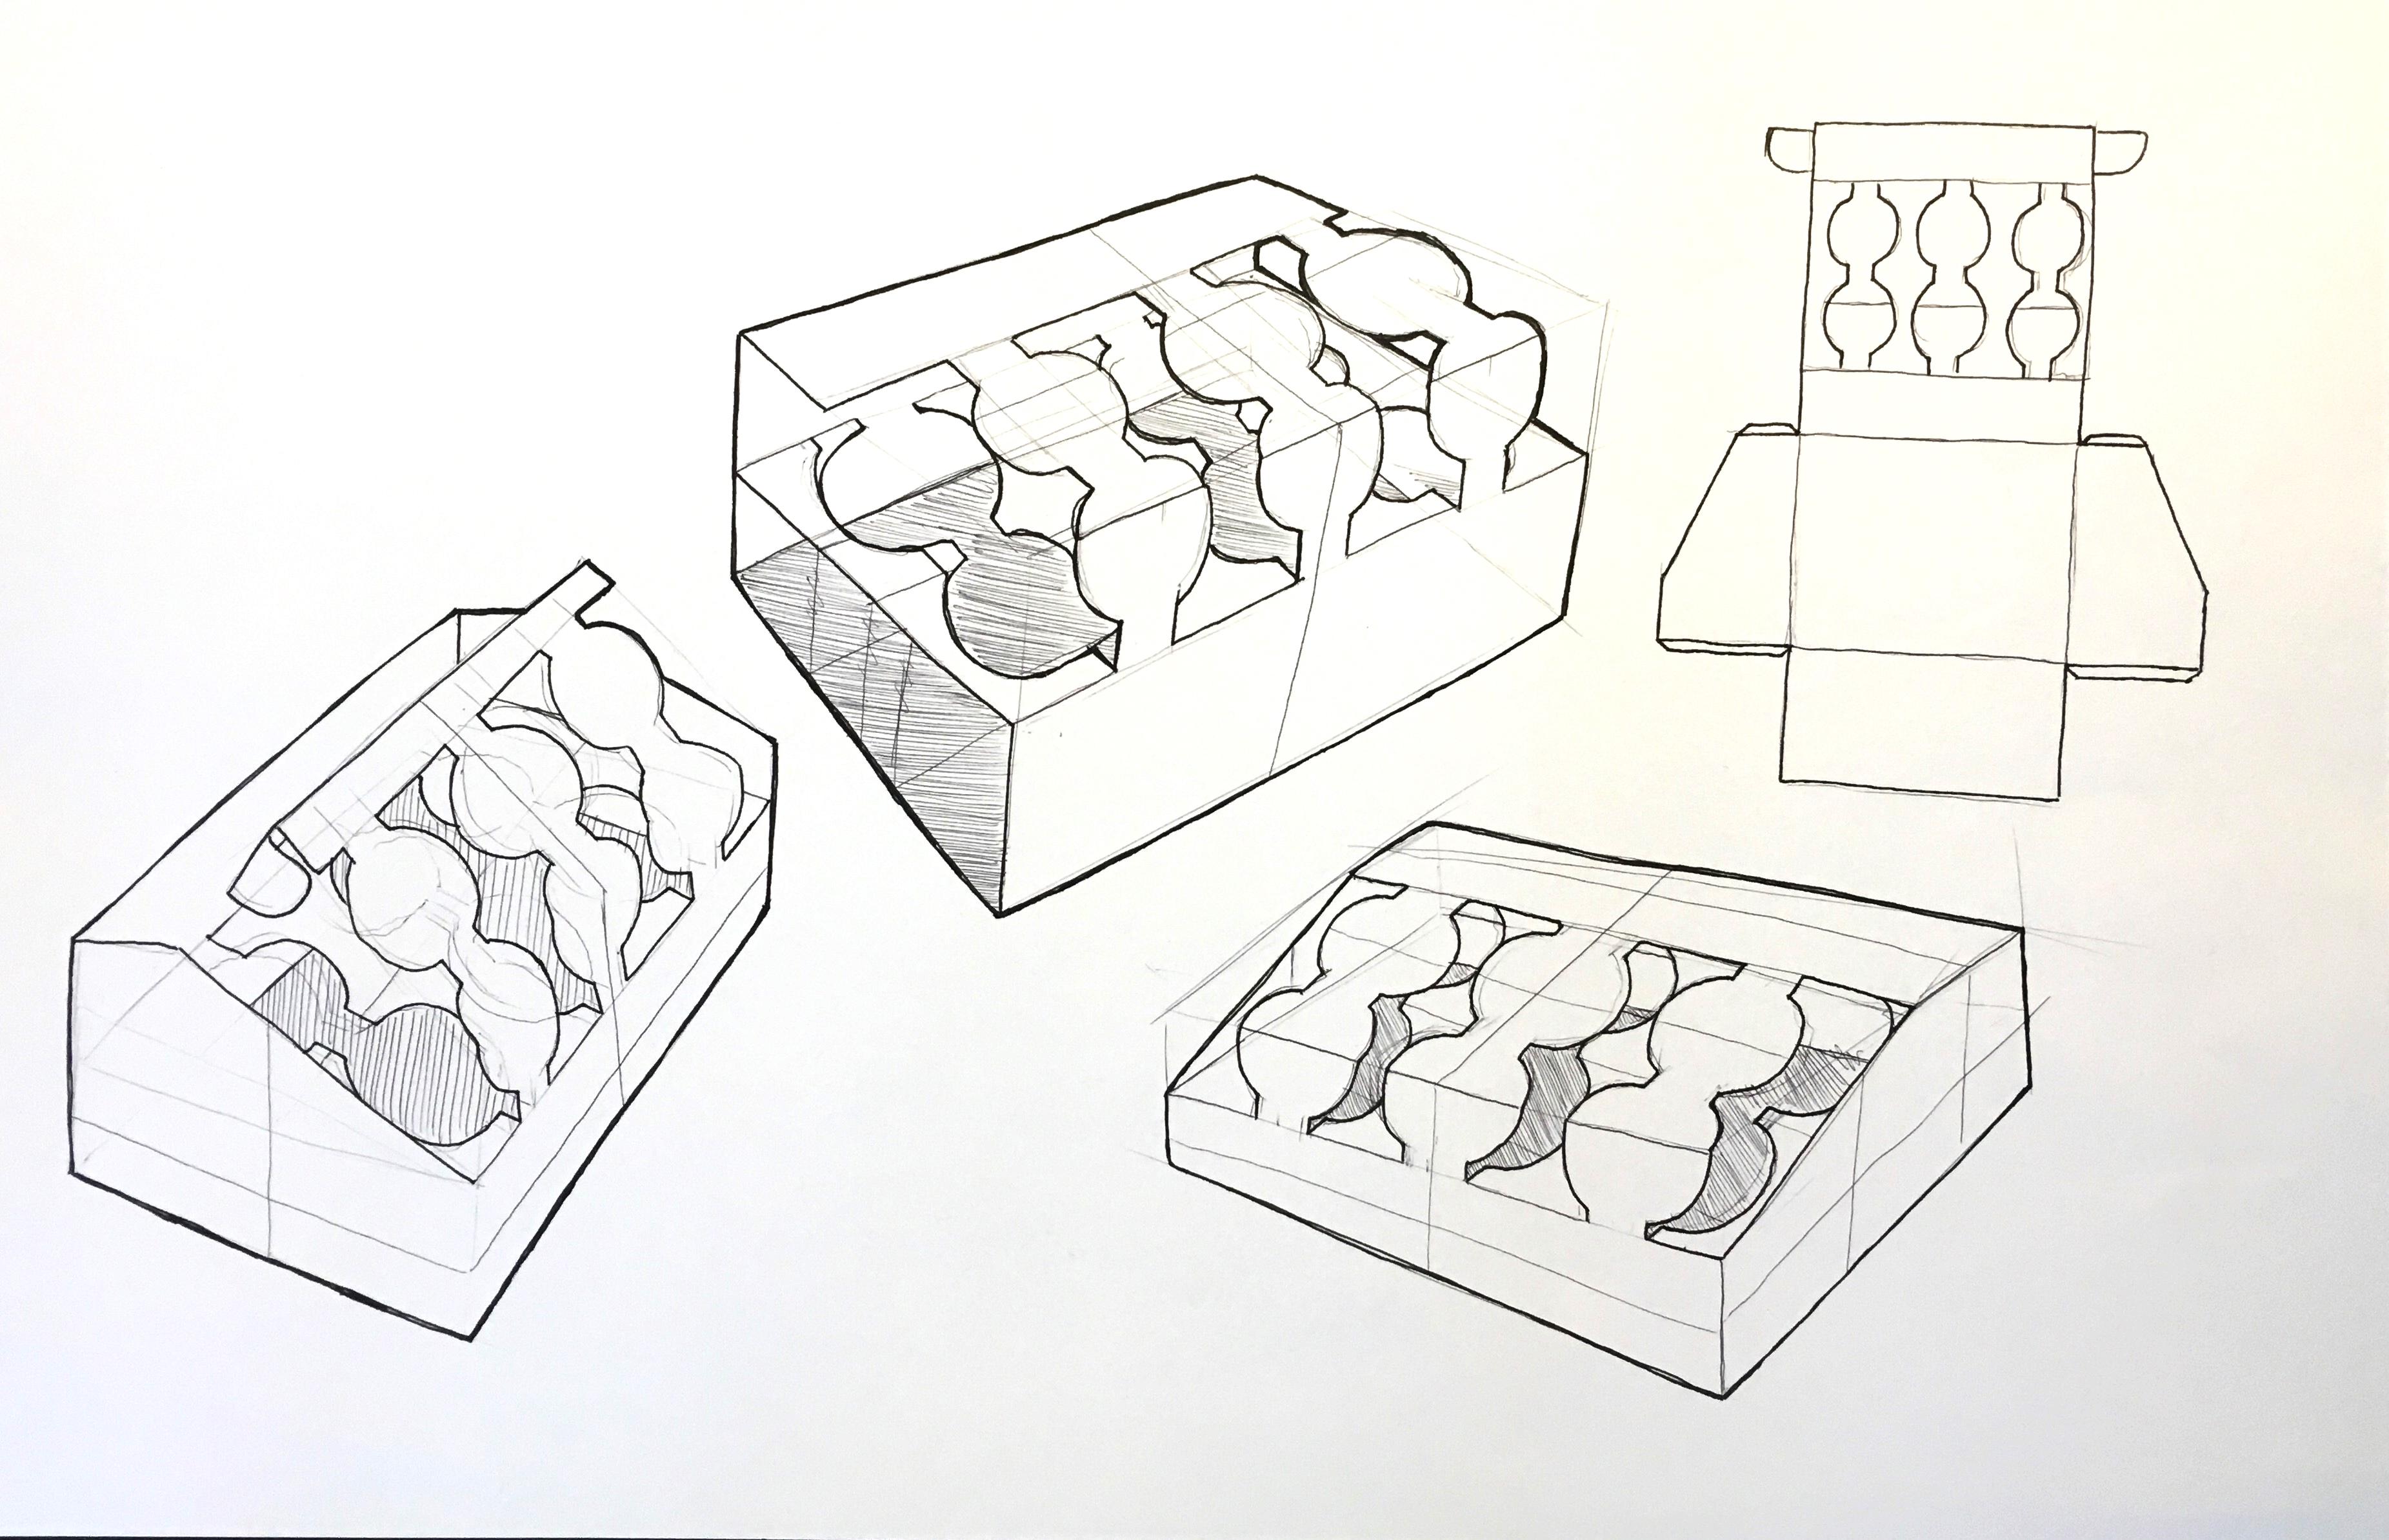 Egg Carrier Sketches